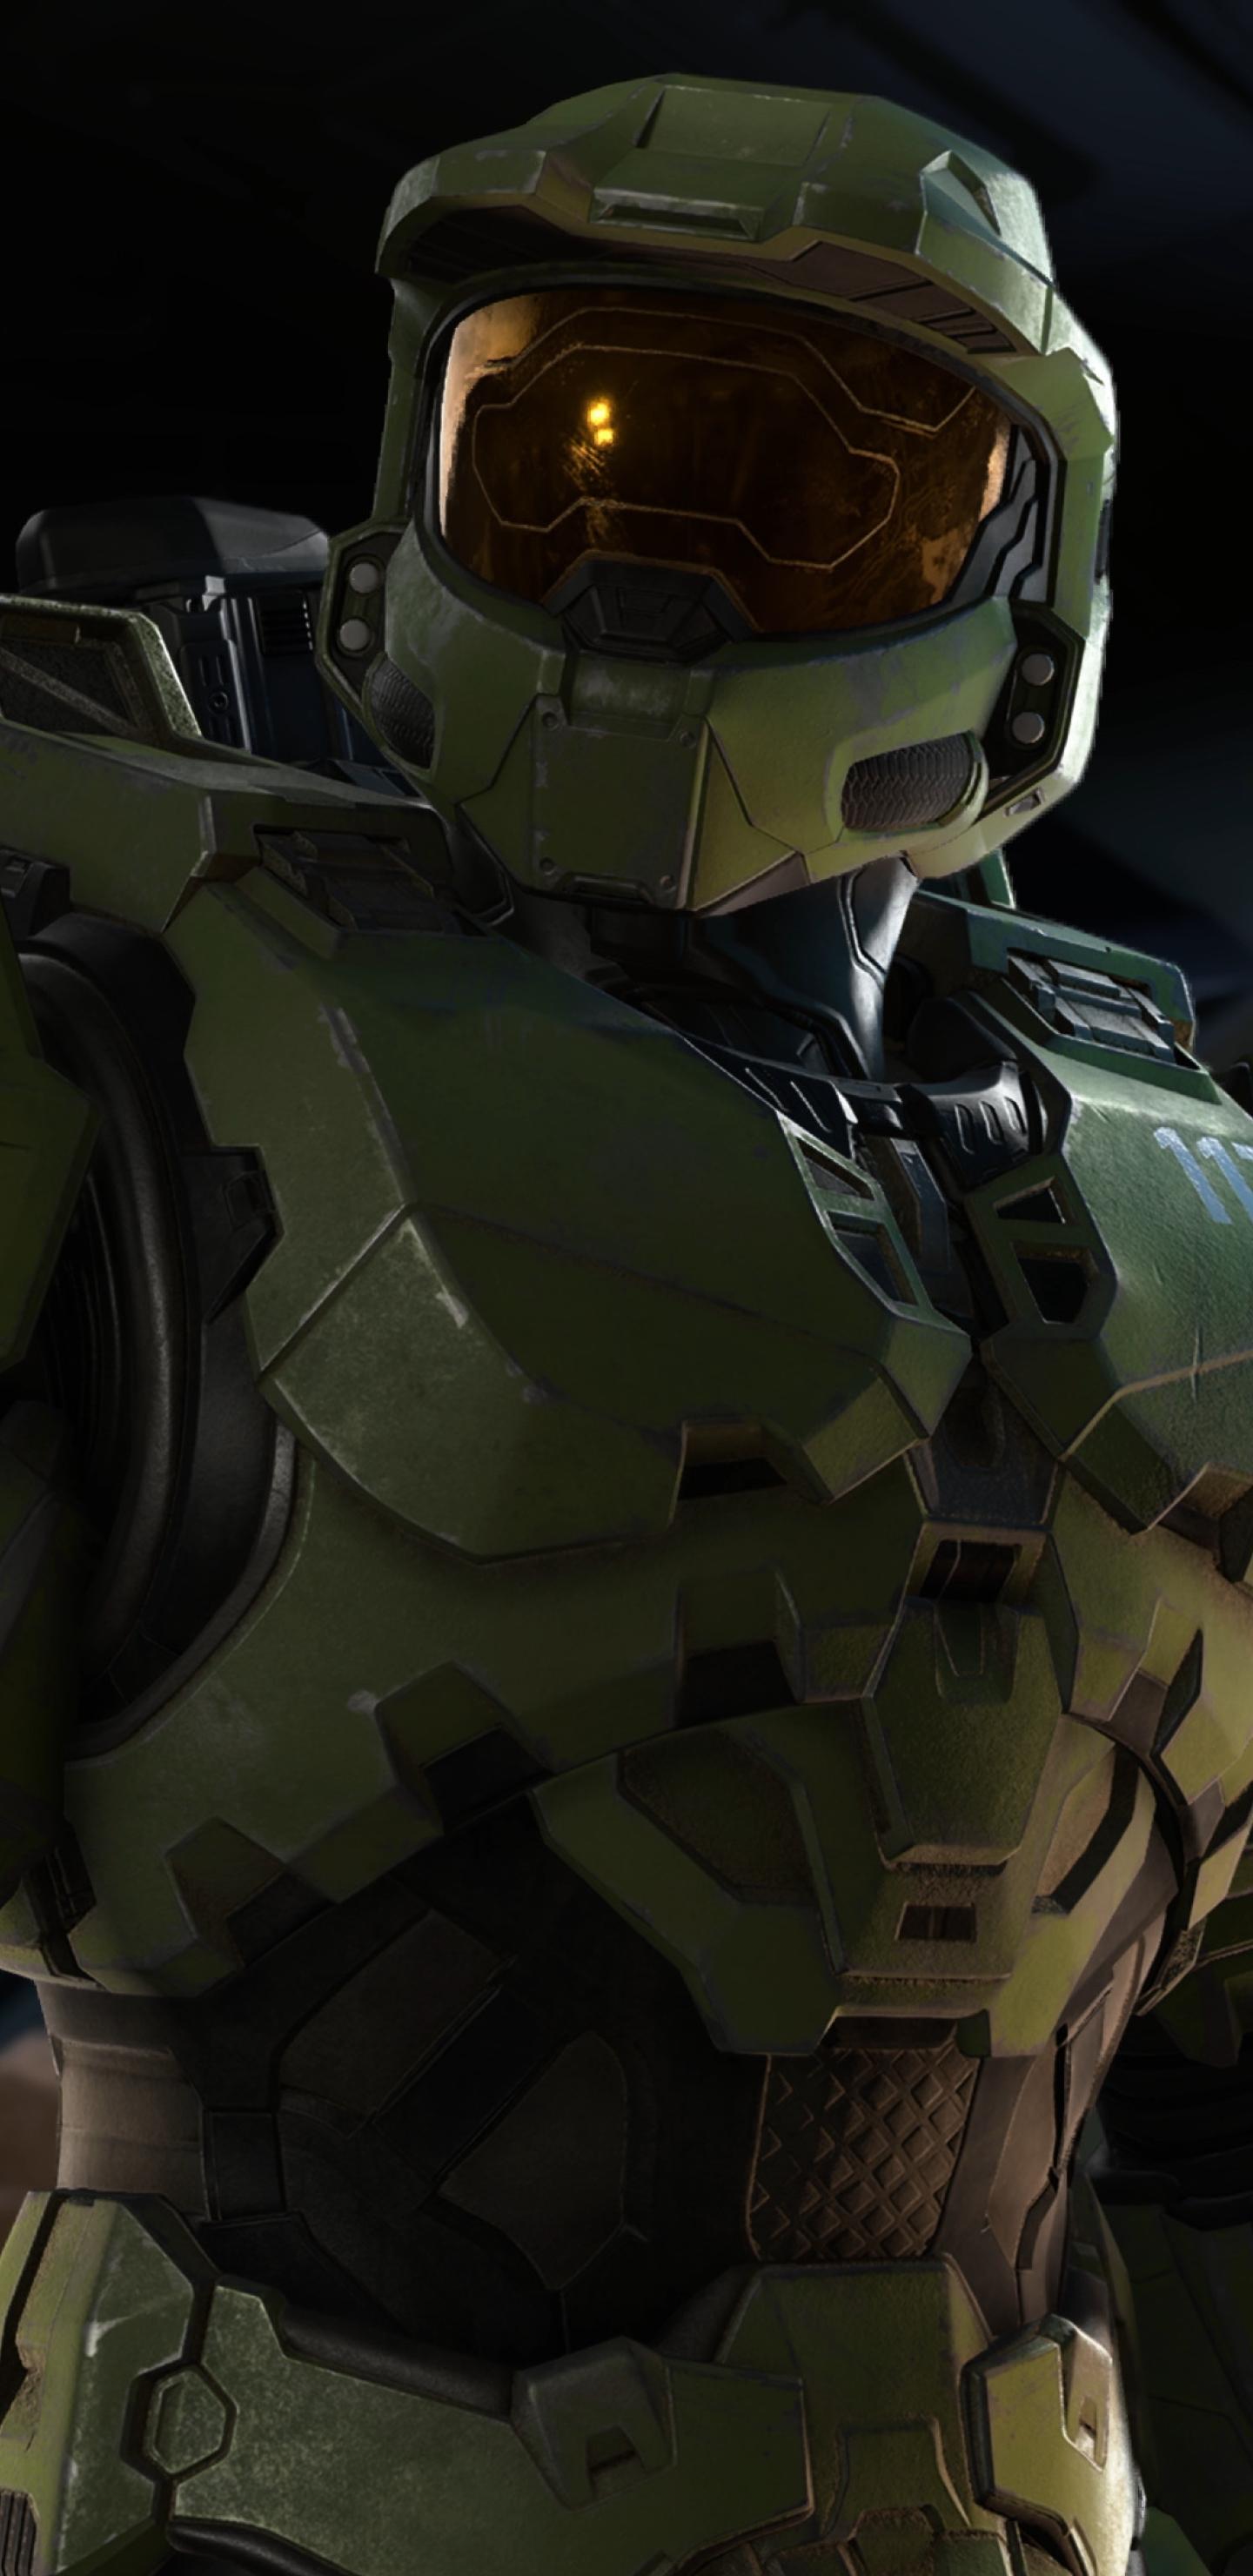 New Halo Infinite 4K Wallpaper in 1440x2960 Resolution